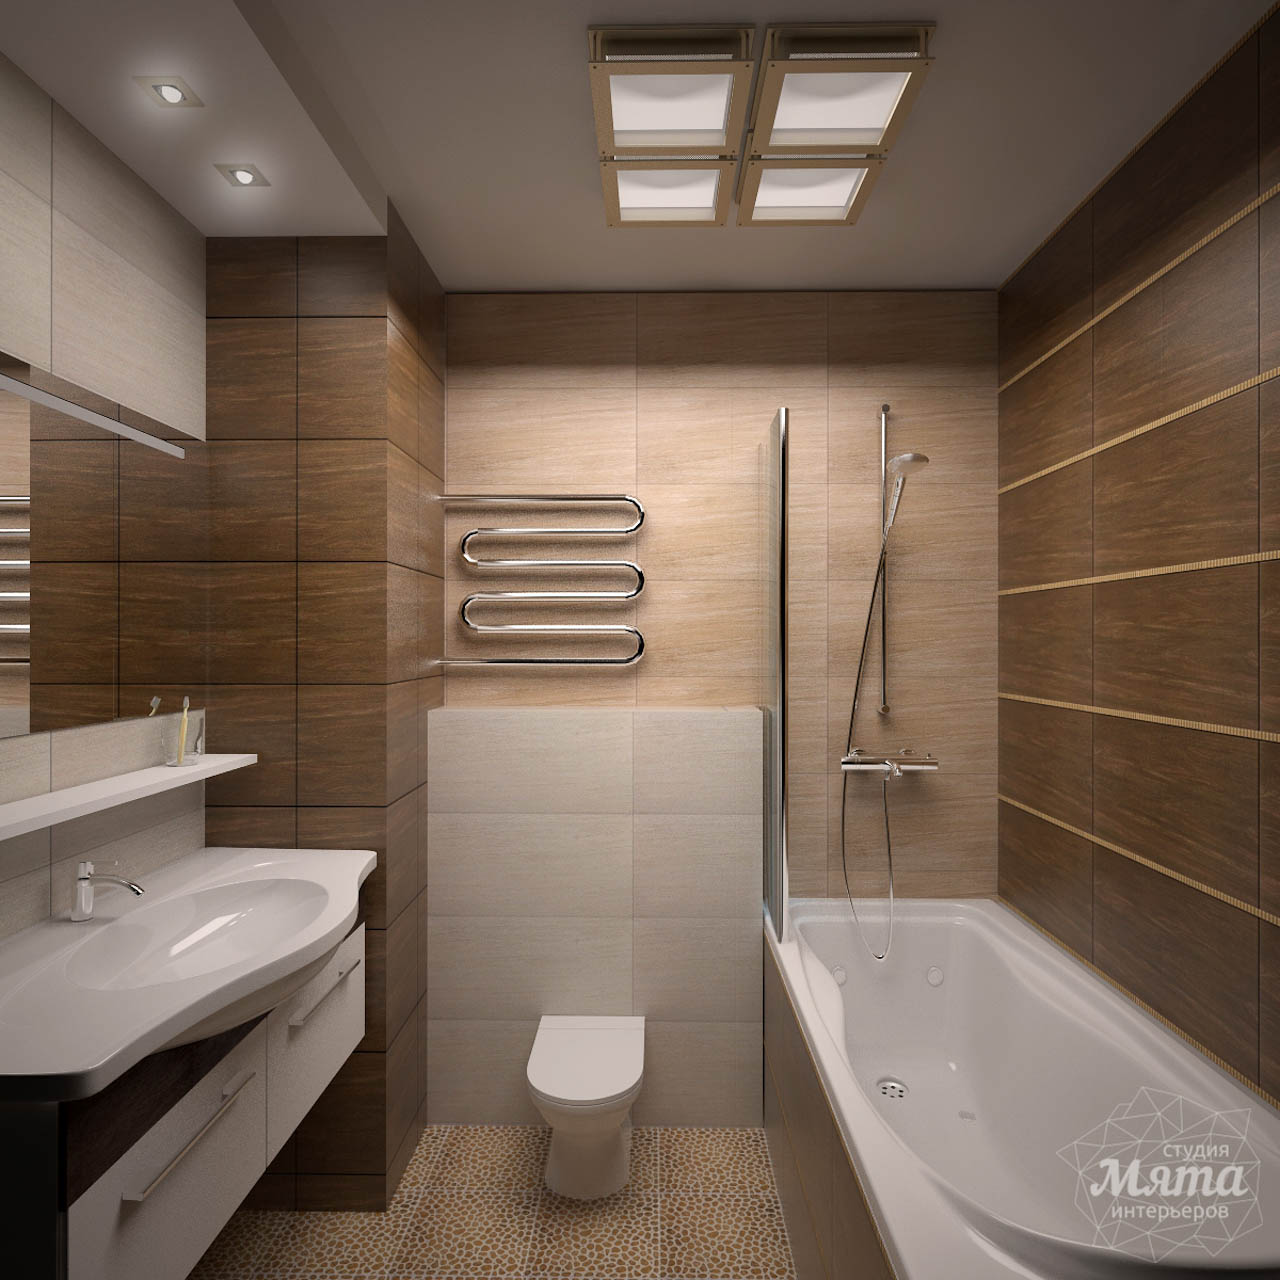 Дизайн интерьера двухкомнатной квартиры по ул. Комсомольская 14 img1825332400